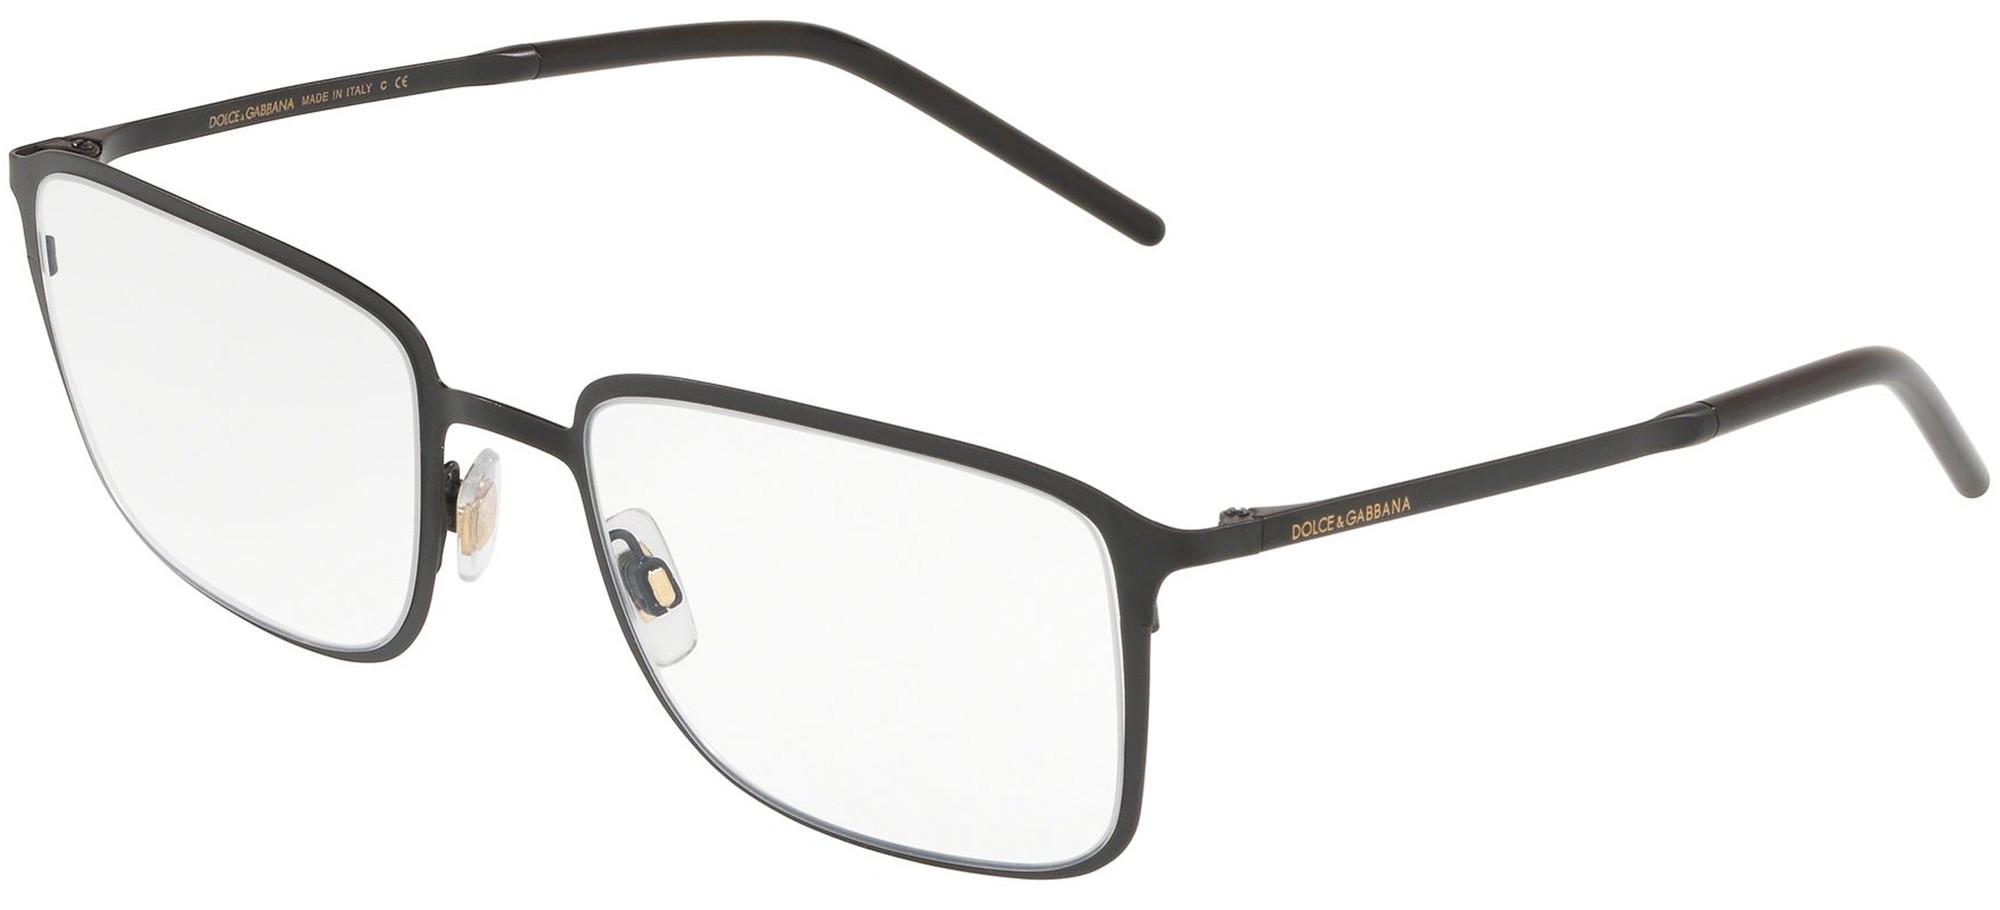 Dolce & Gabbana eyeglasses MADISON DG 1316